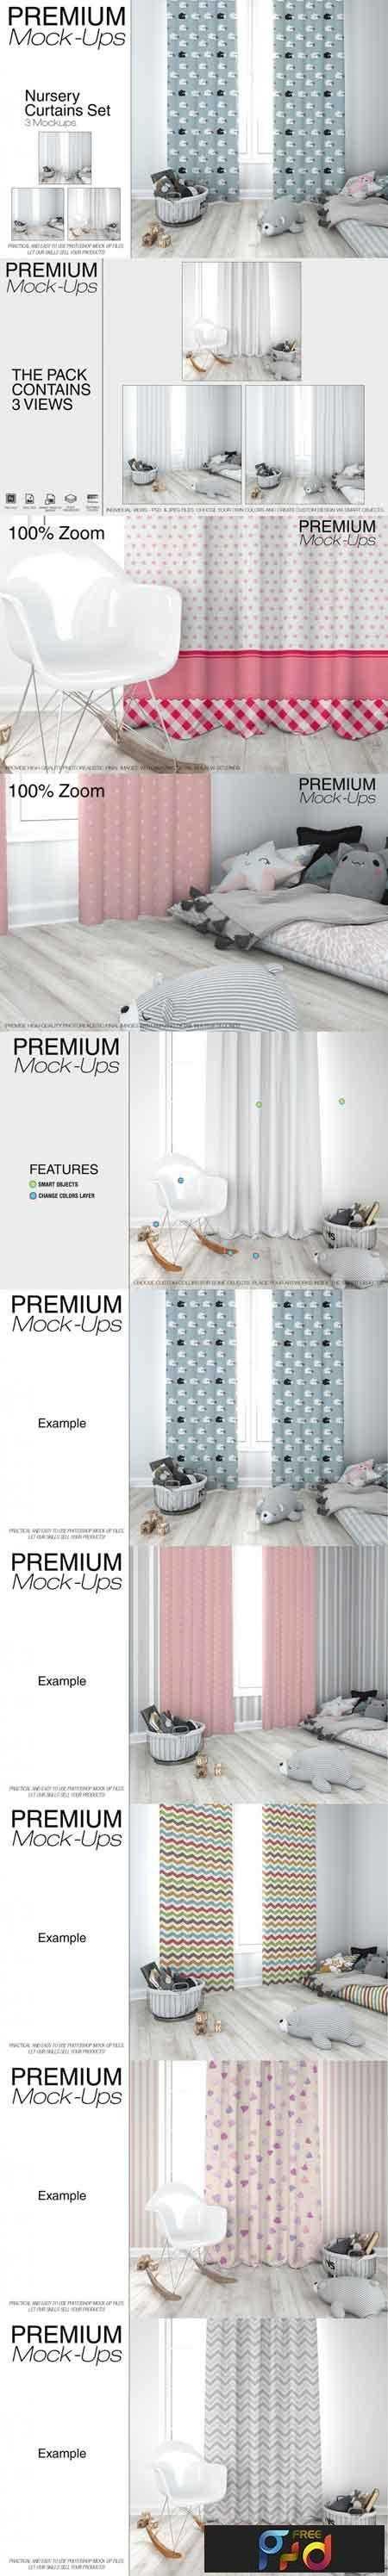 1808140 Kids Room - Curtains Mockup Pack 3468694 1